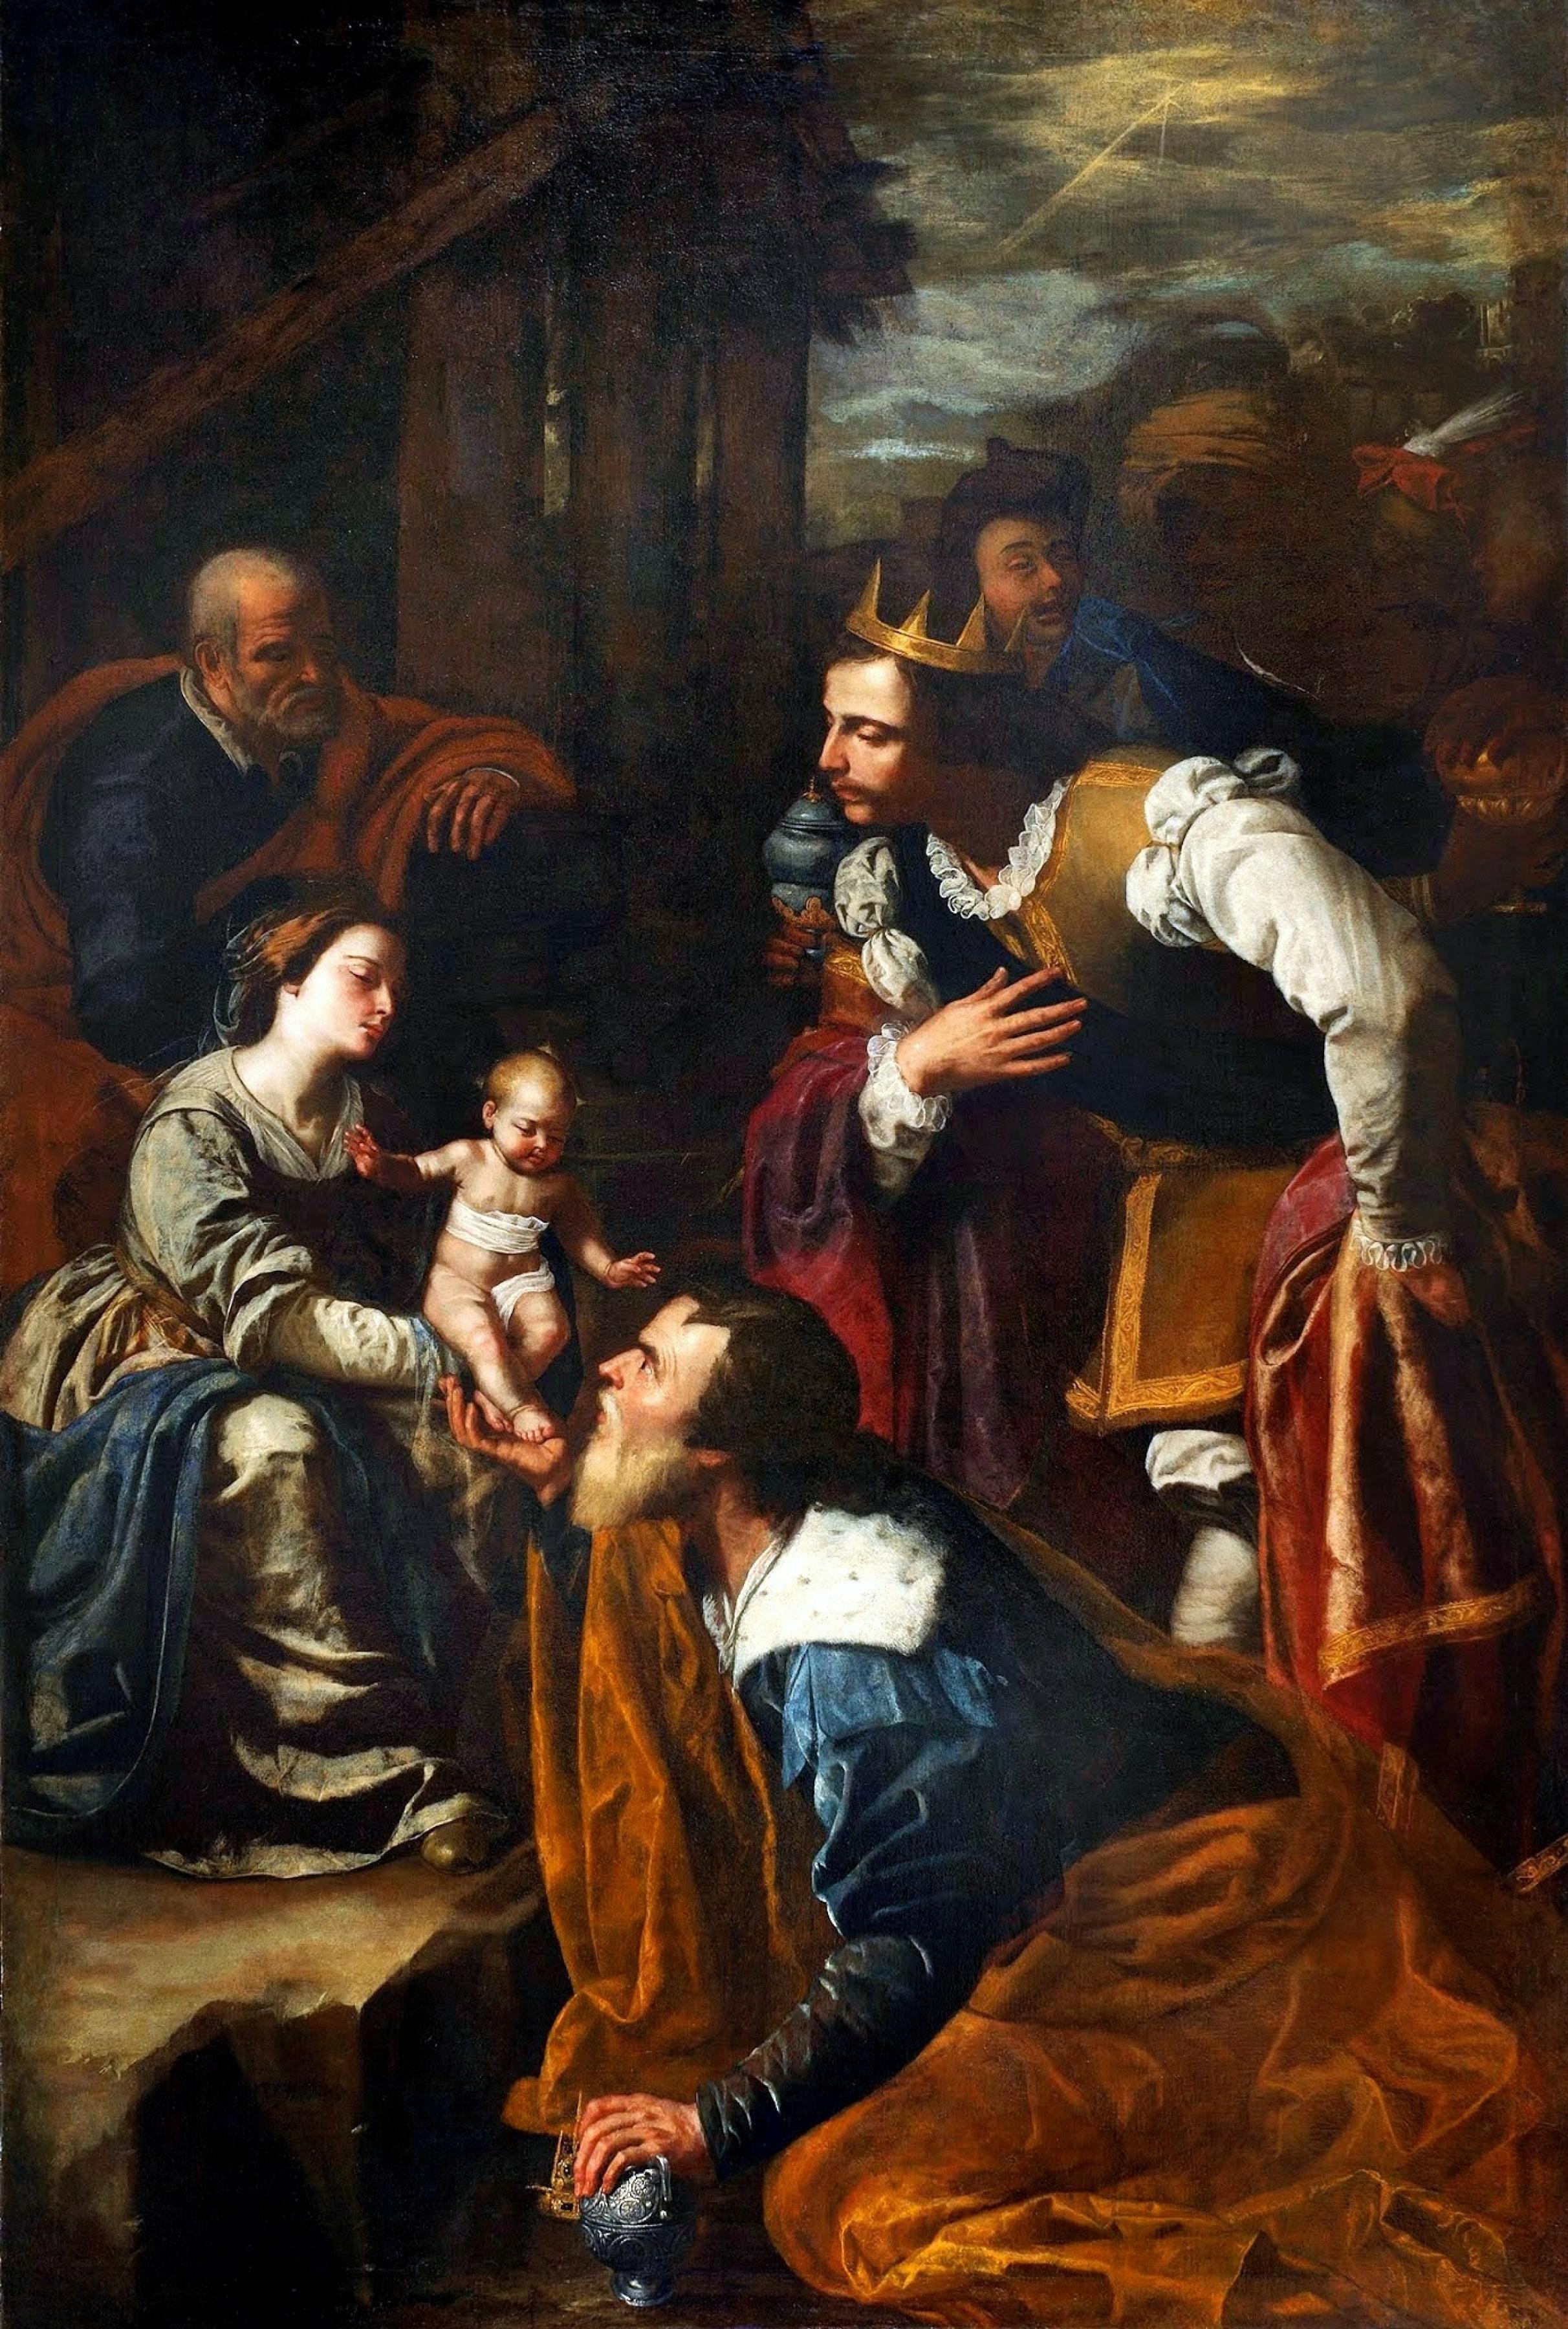 Adoration of the Magi by Artemisia Gentileschi History